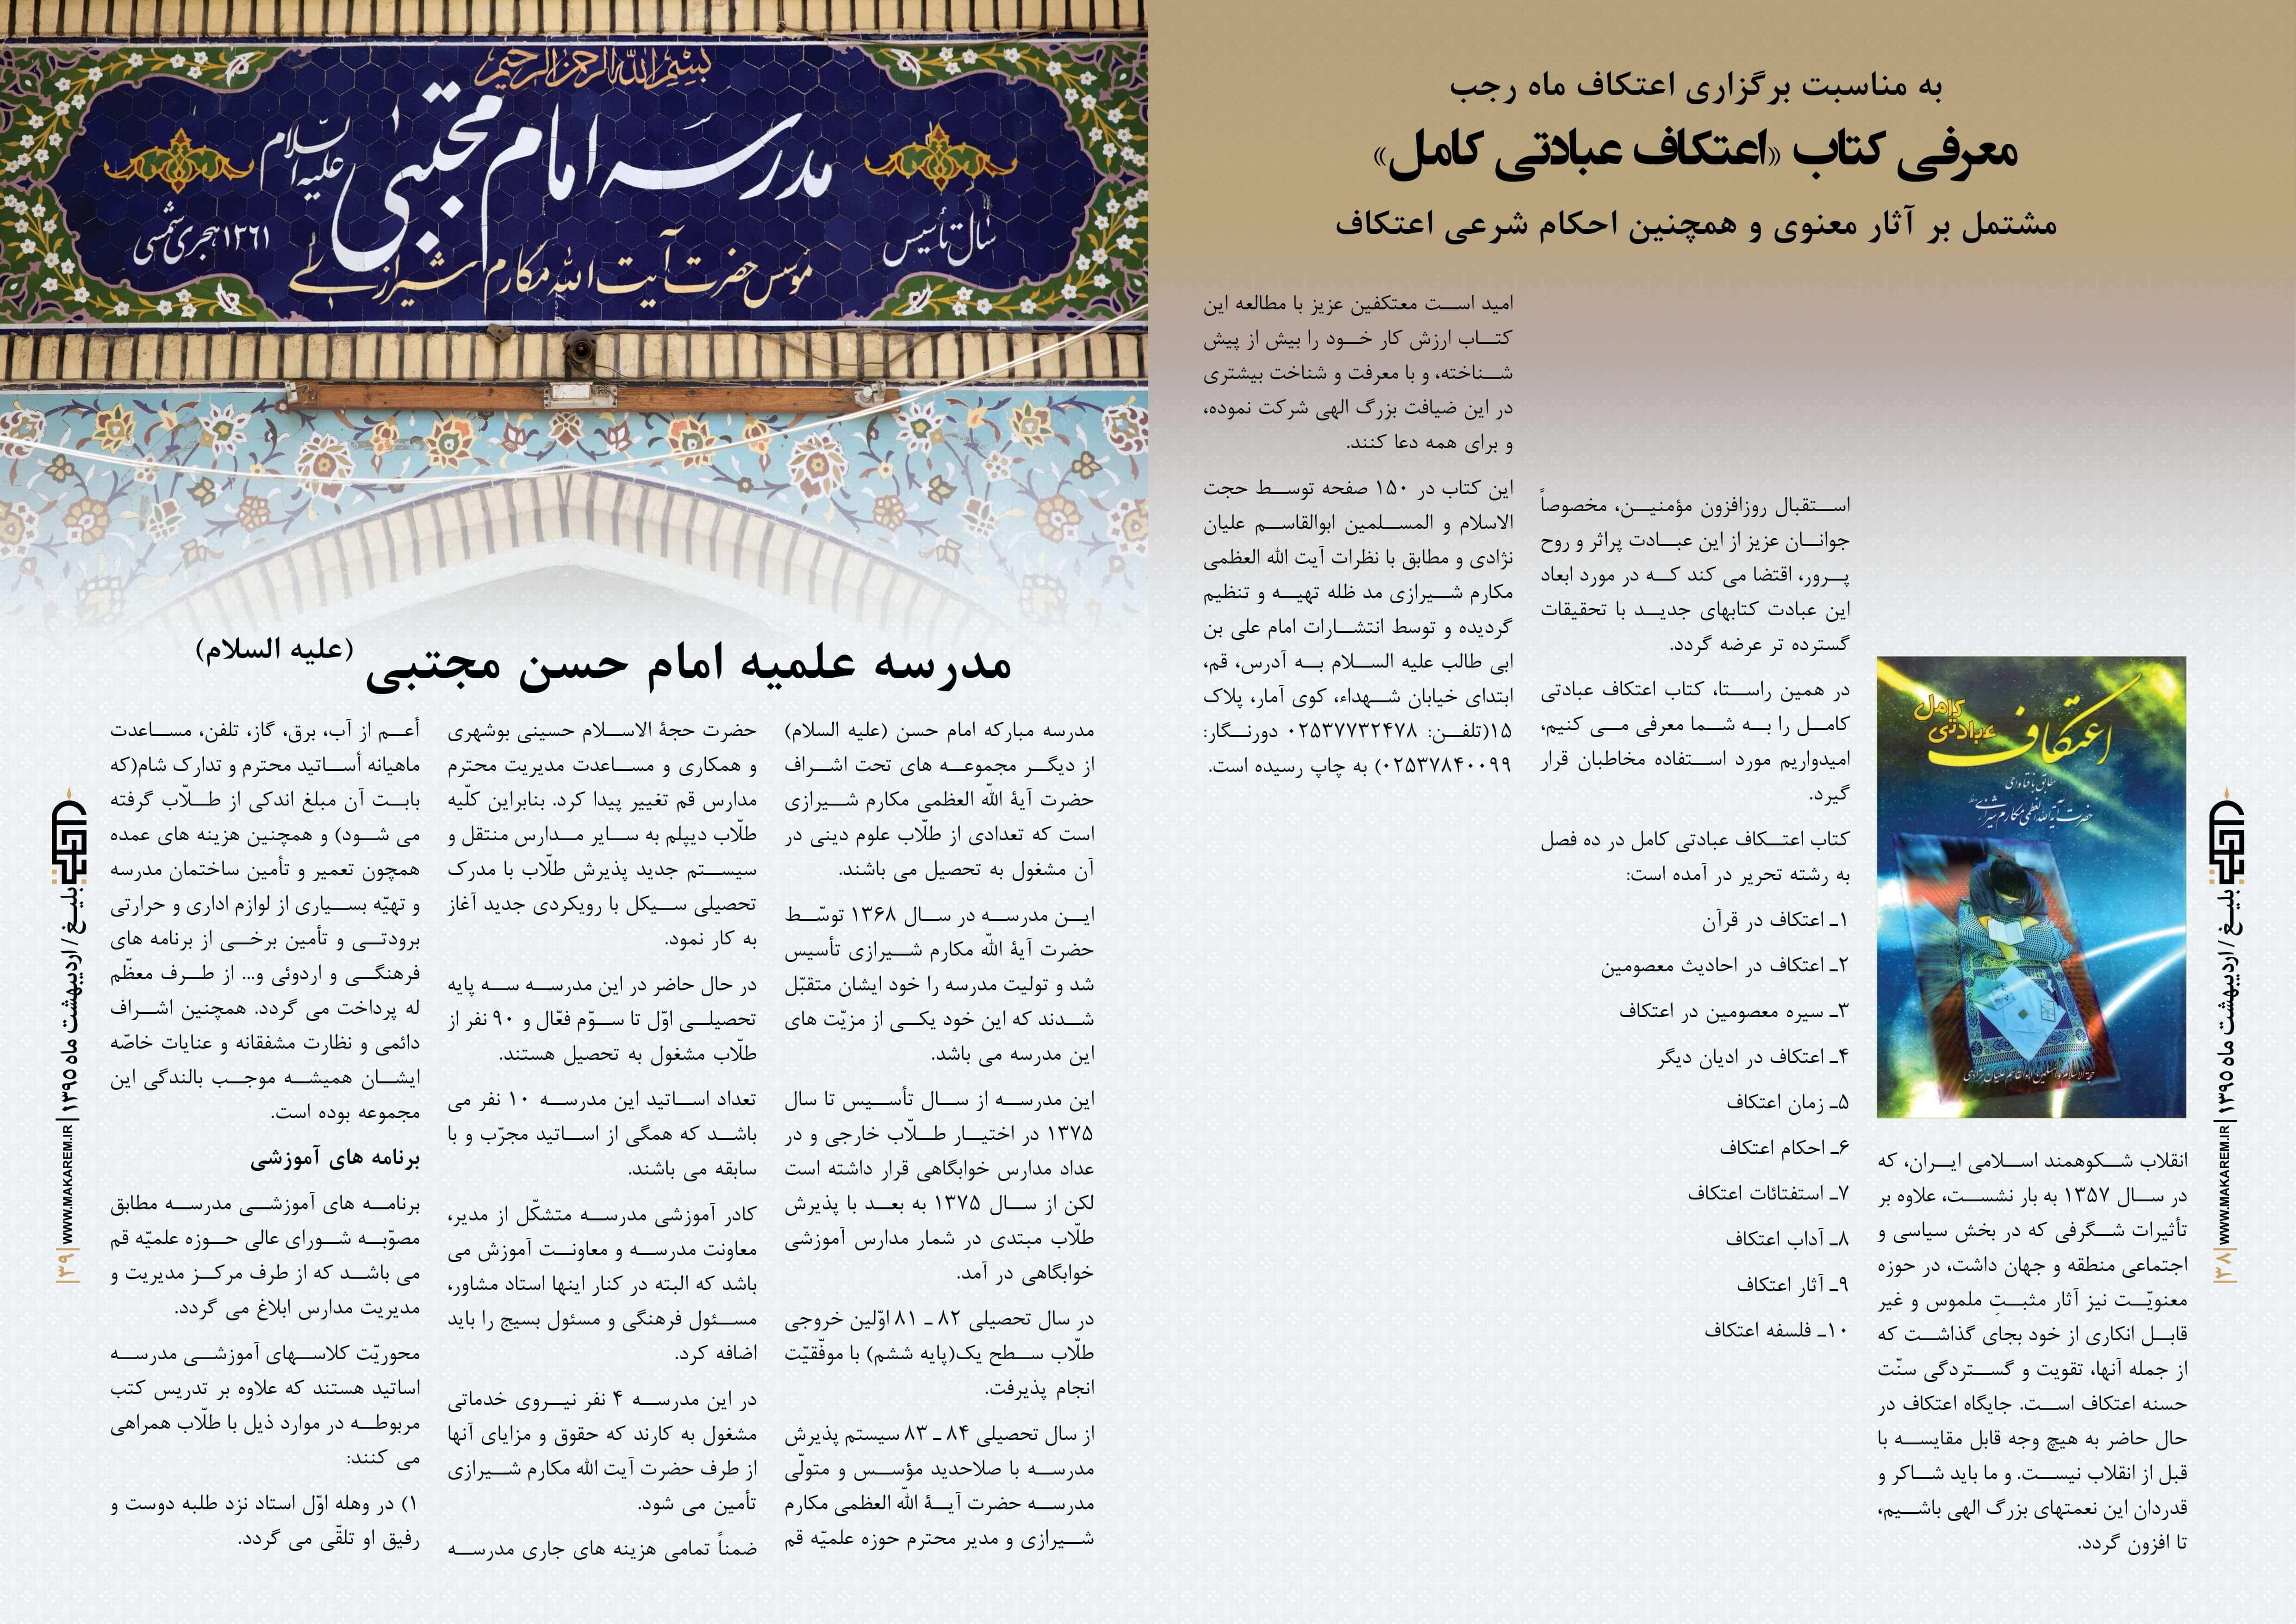 20-مدرسه الامام امیر المومنین (ع)